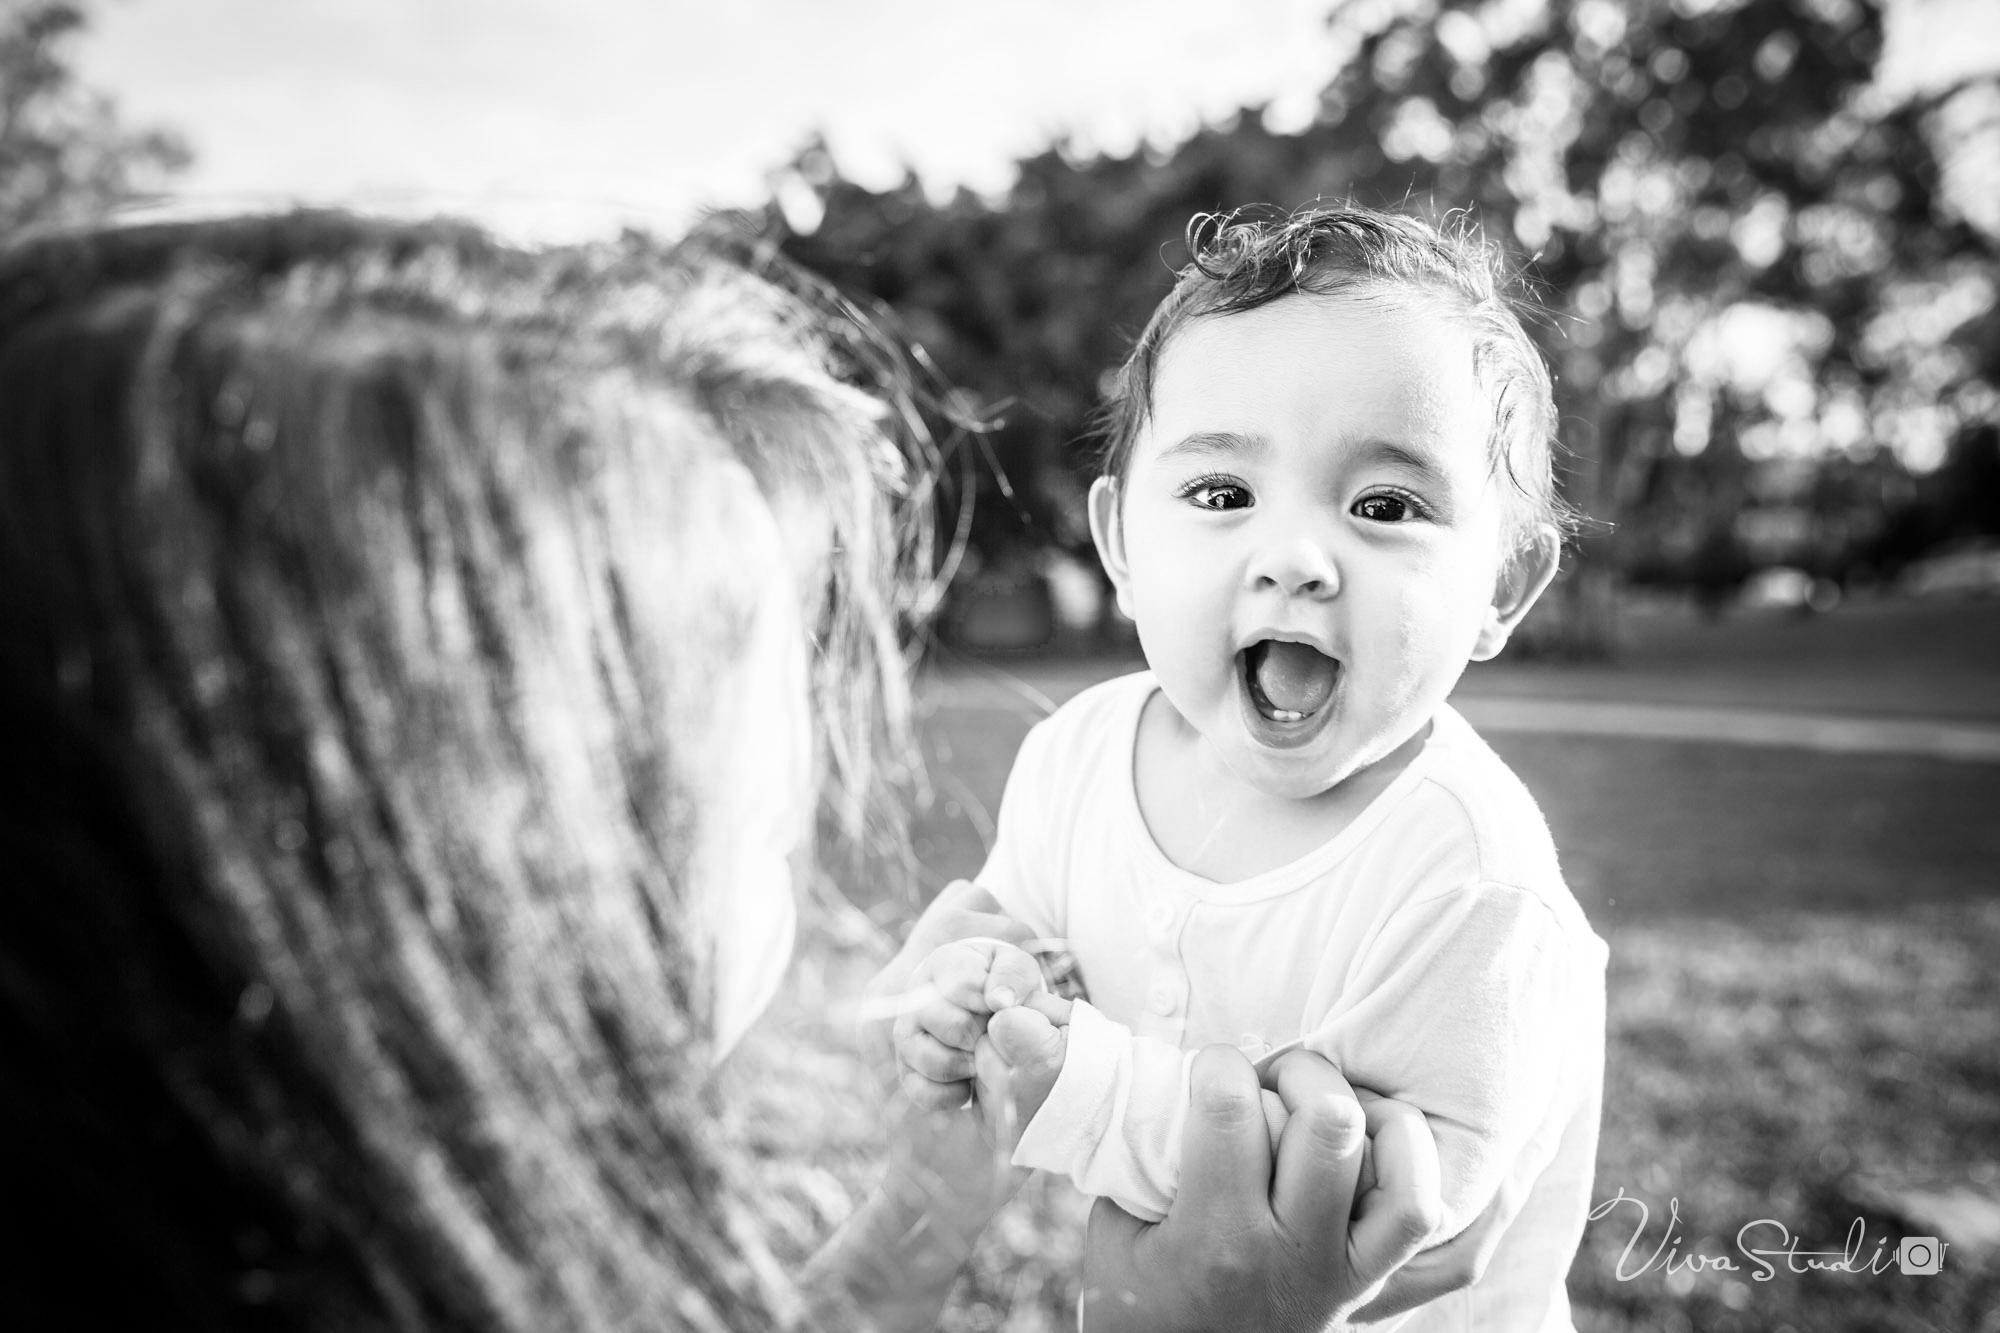 VivaStudio_Newborn_Baby_Family_Photography_Toowoong_Perrin_Park_Brisbane_043